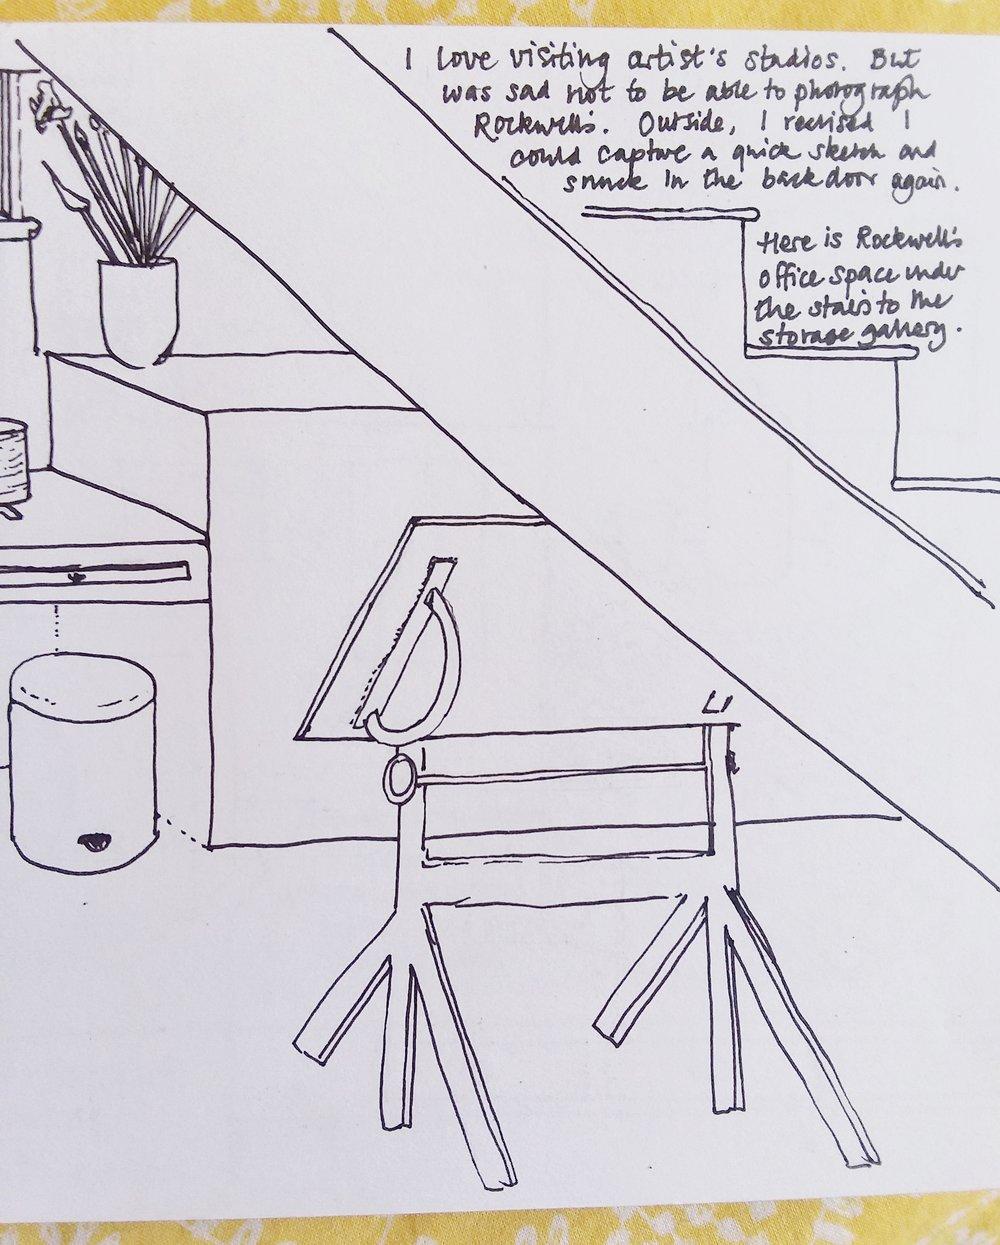 norman-rockwell-studio-1